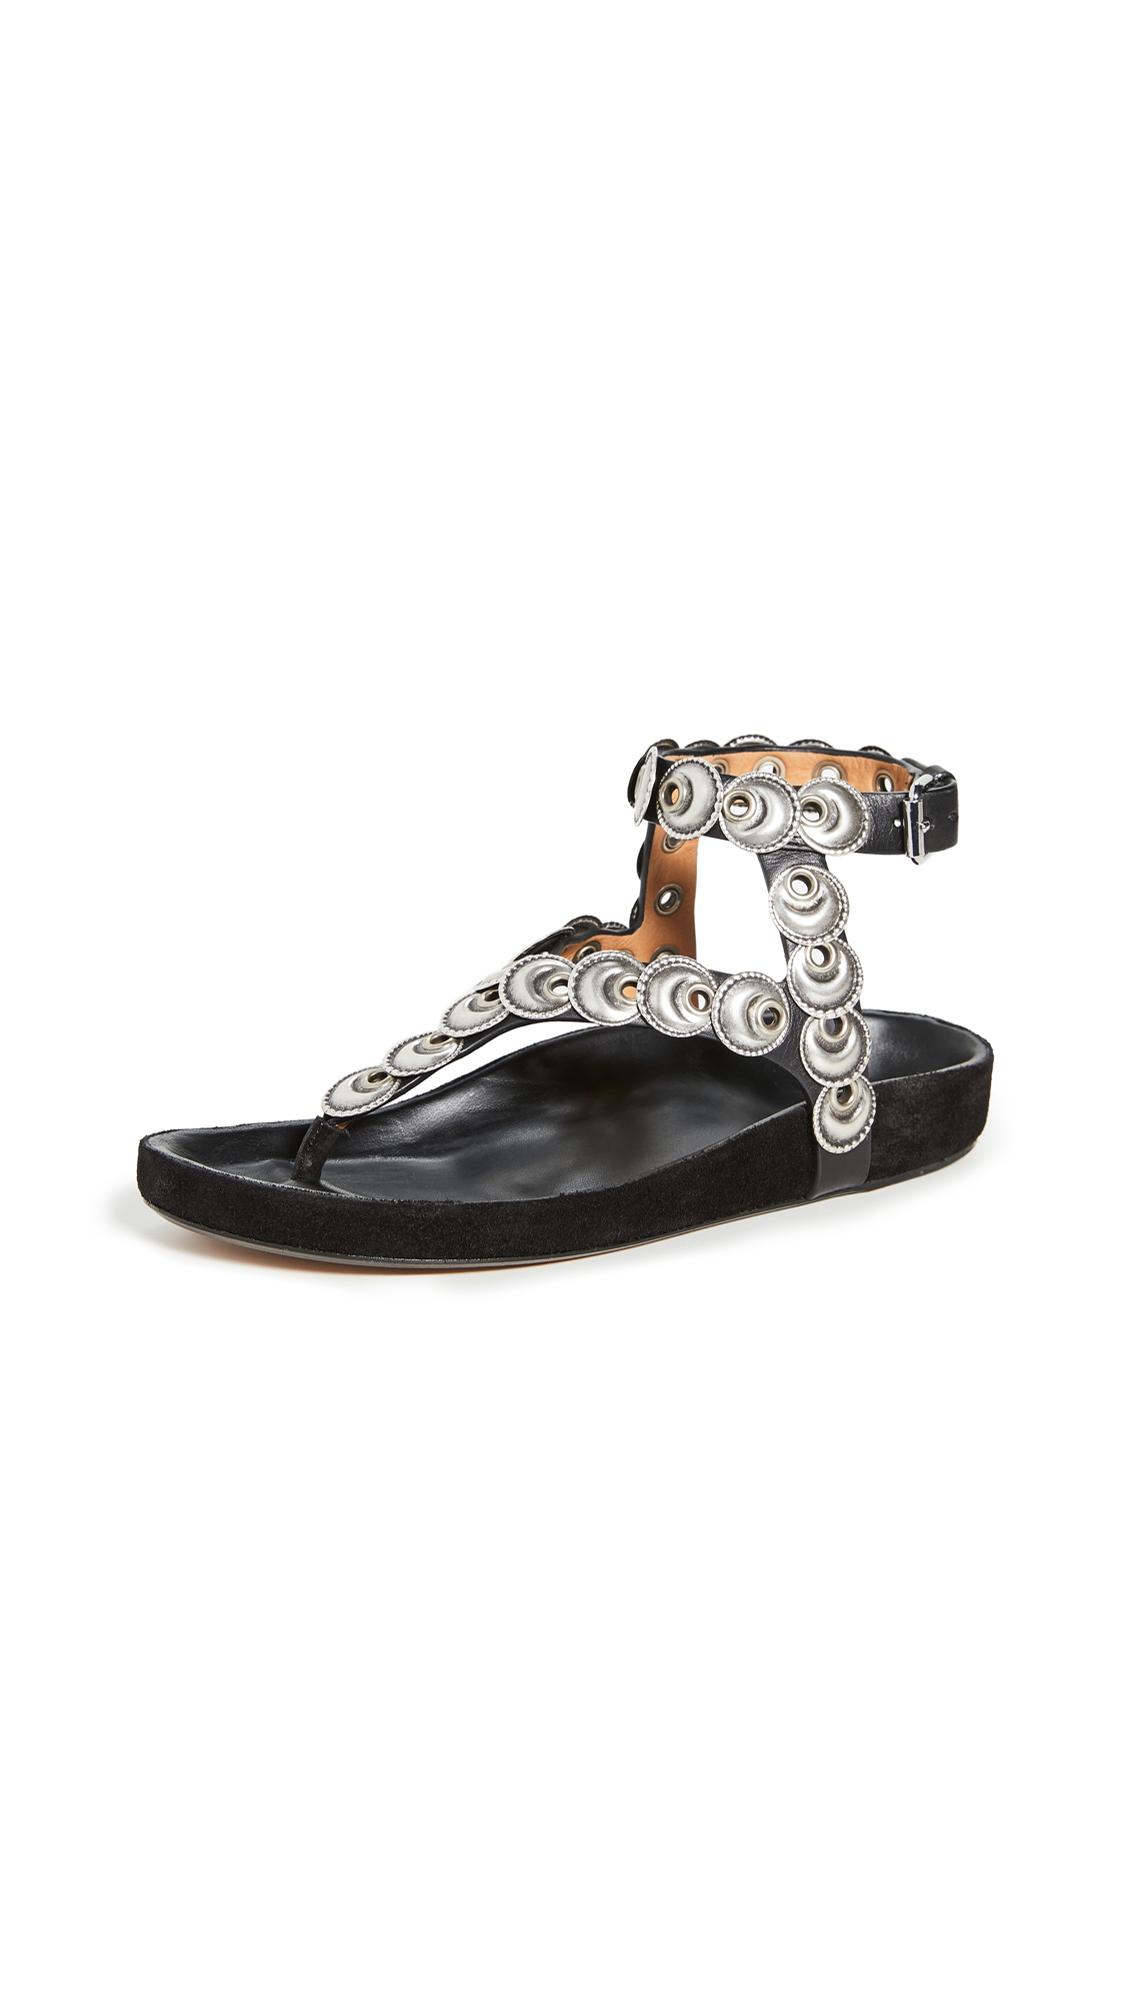 Isabel Marant Eldo Sandal - 50% Off Sale